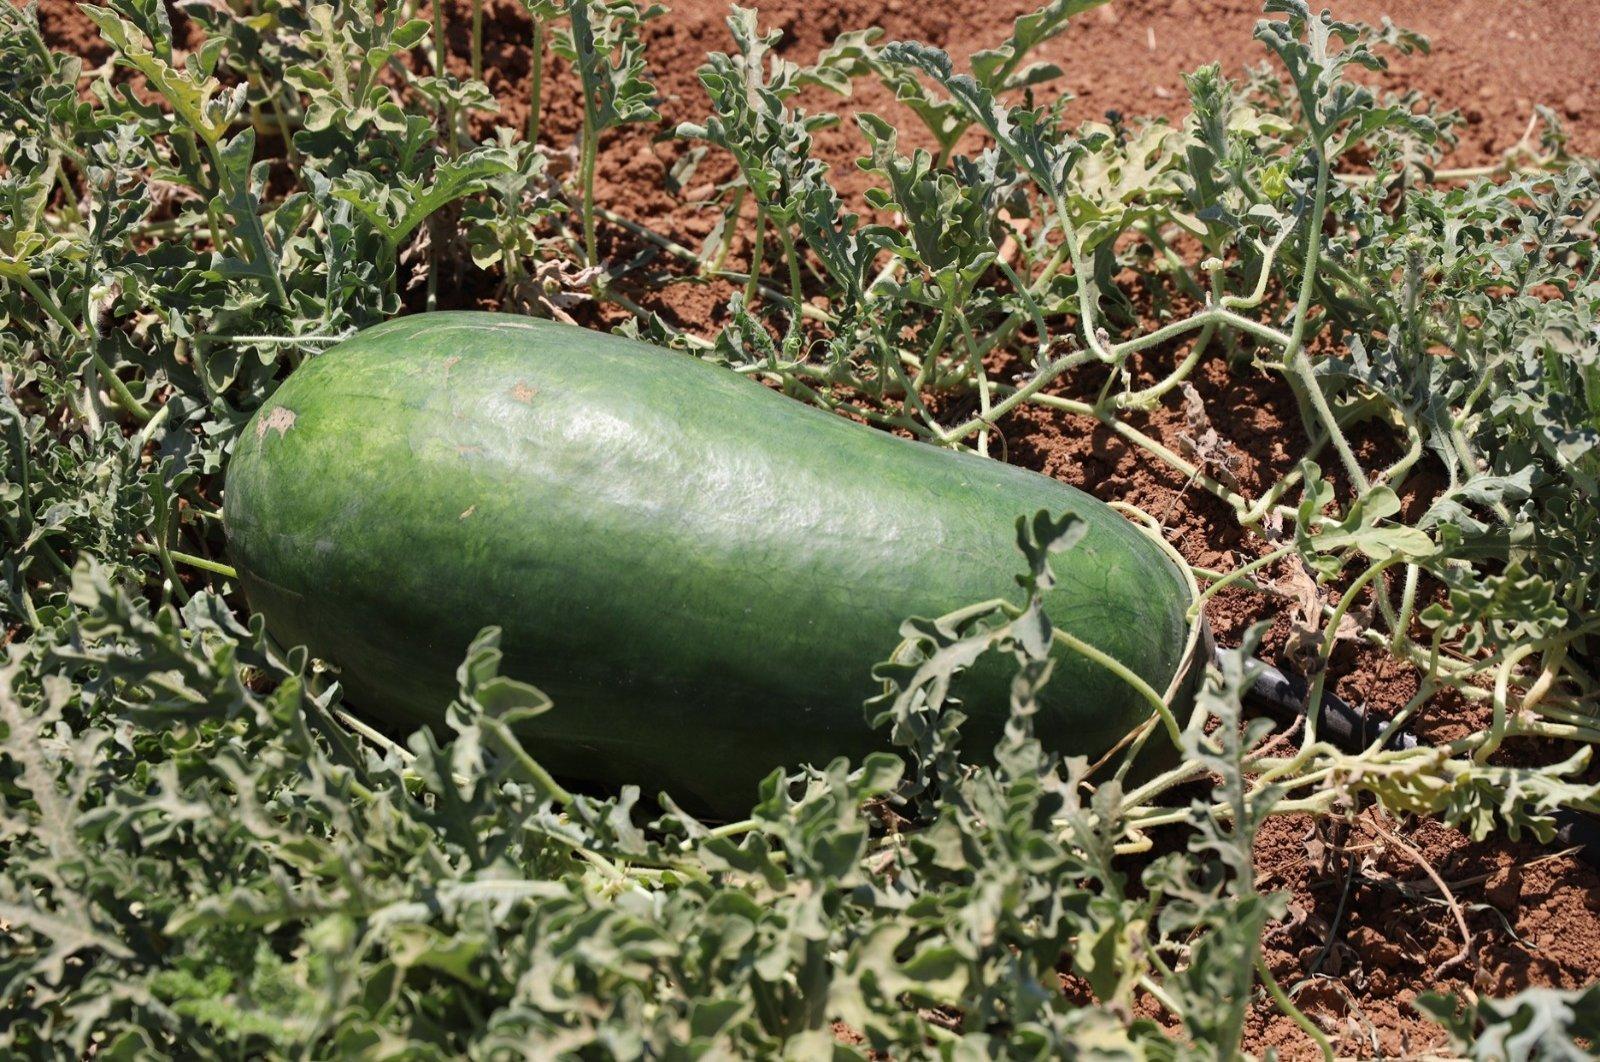 The tat karpuzu of Şanlıurfa looks and tastes different than the watermelons of Diyarbakır. (DHA Photo)